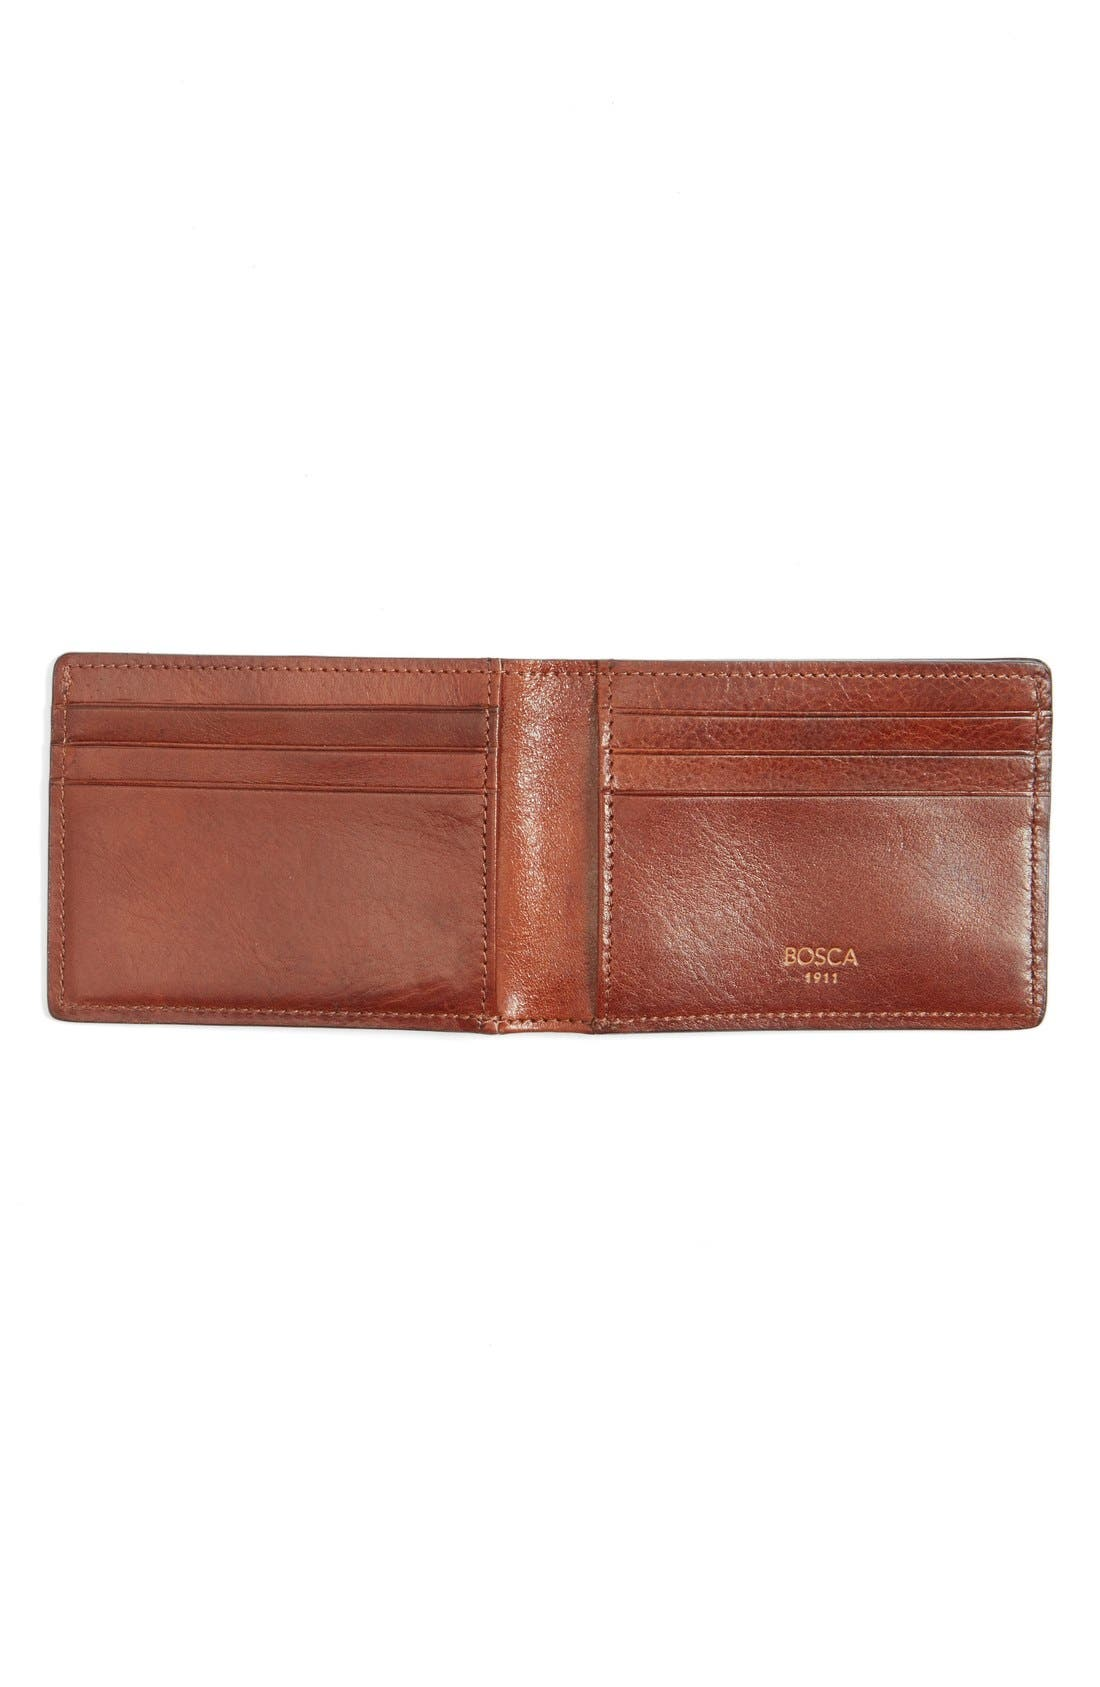 BOSCA,                             Leather Bifold Wallet,                             Alternate thumbnail 2, color,                             233